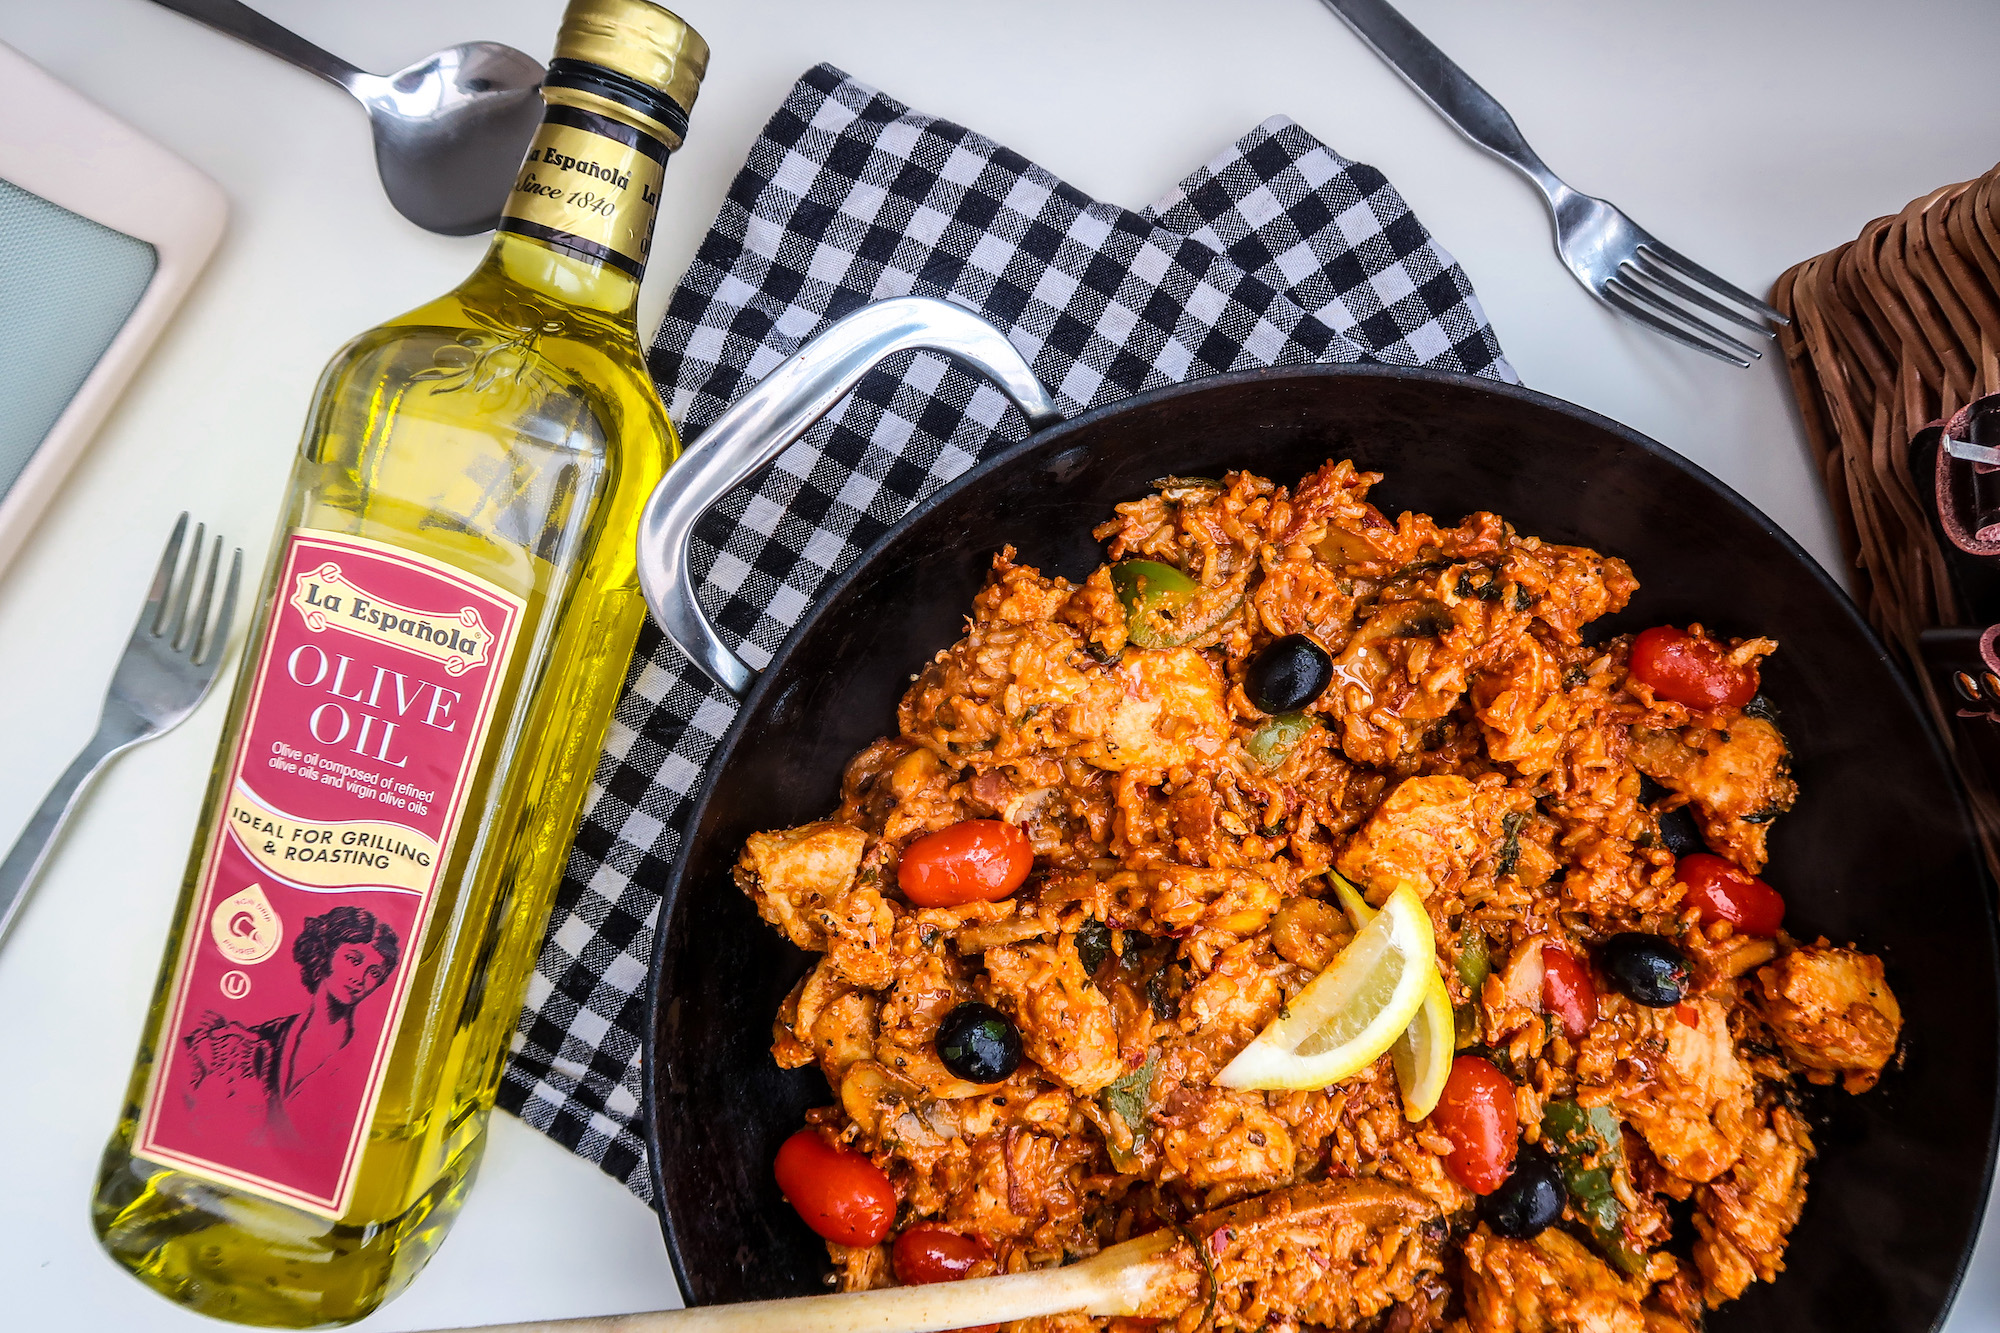 Spanish Chicken & Chorizo Paella | | Quarantine Homemade Left Over Cupboard Store Item Recipes | Elle Blonde Luxury Lifestyle Destination Blog